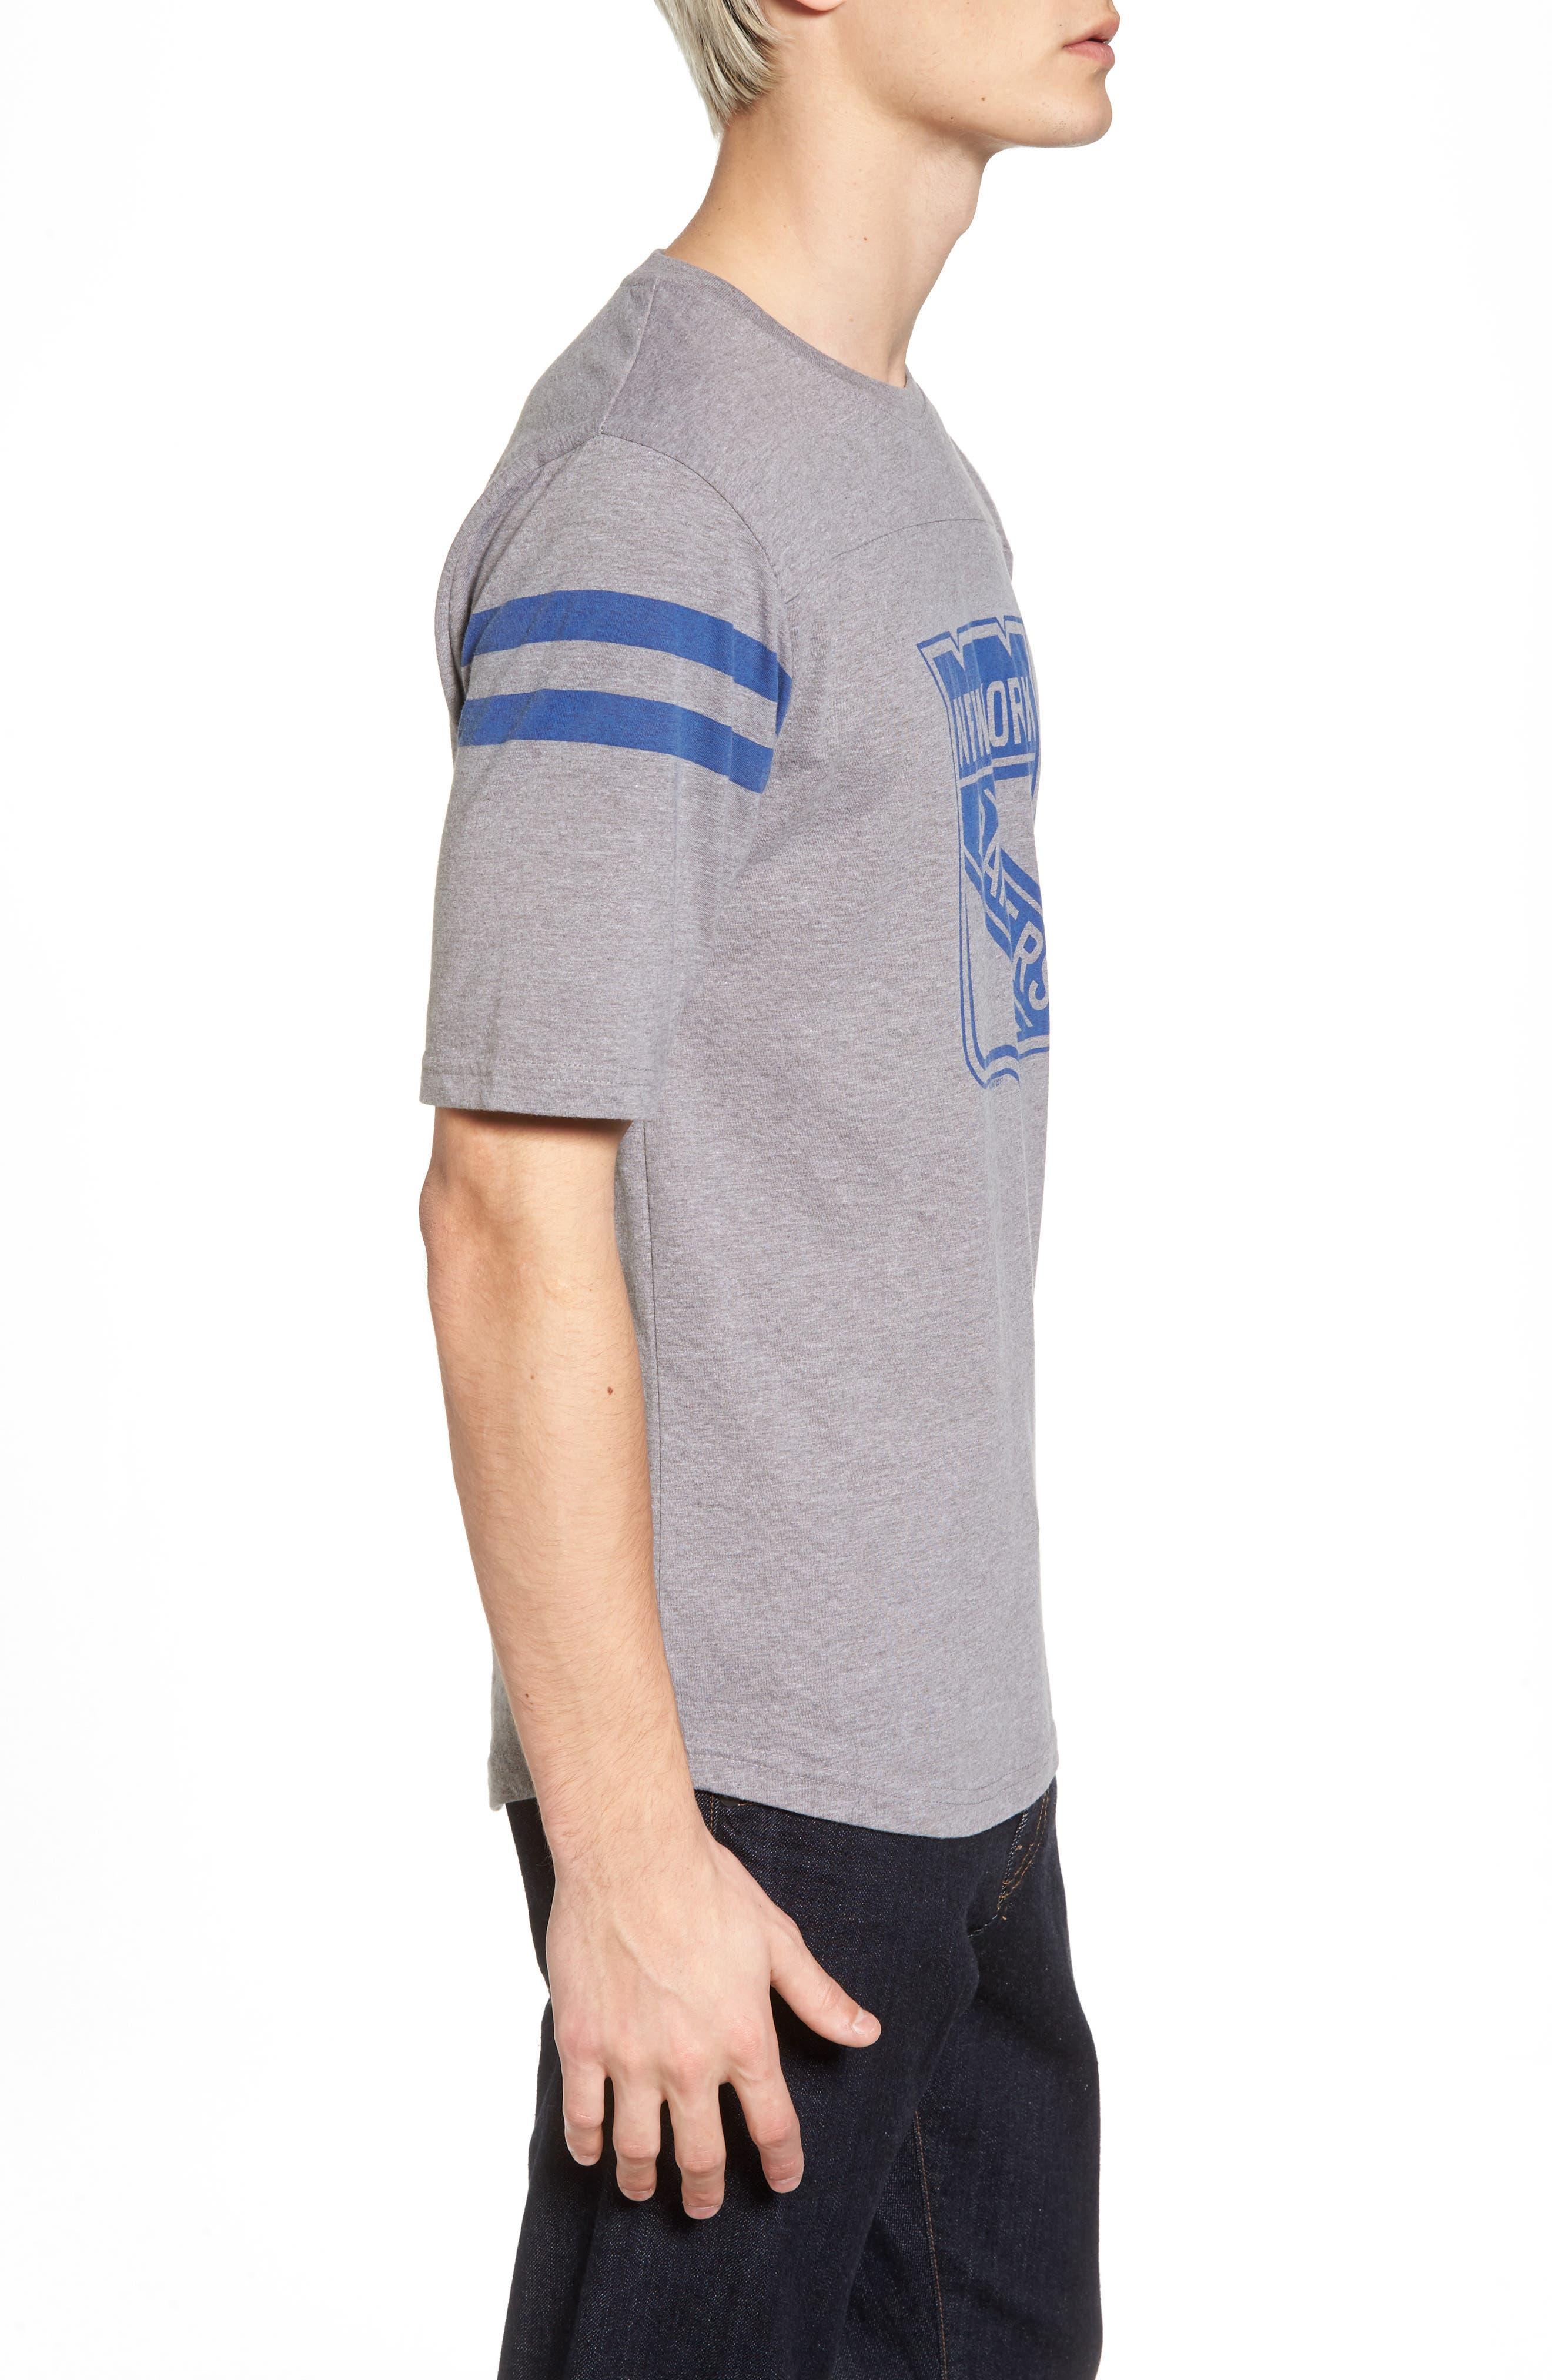 Crosby New York Rangers T-Shirt,                             Alternate thumbnail 3, color,                             073